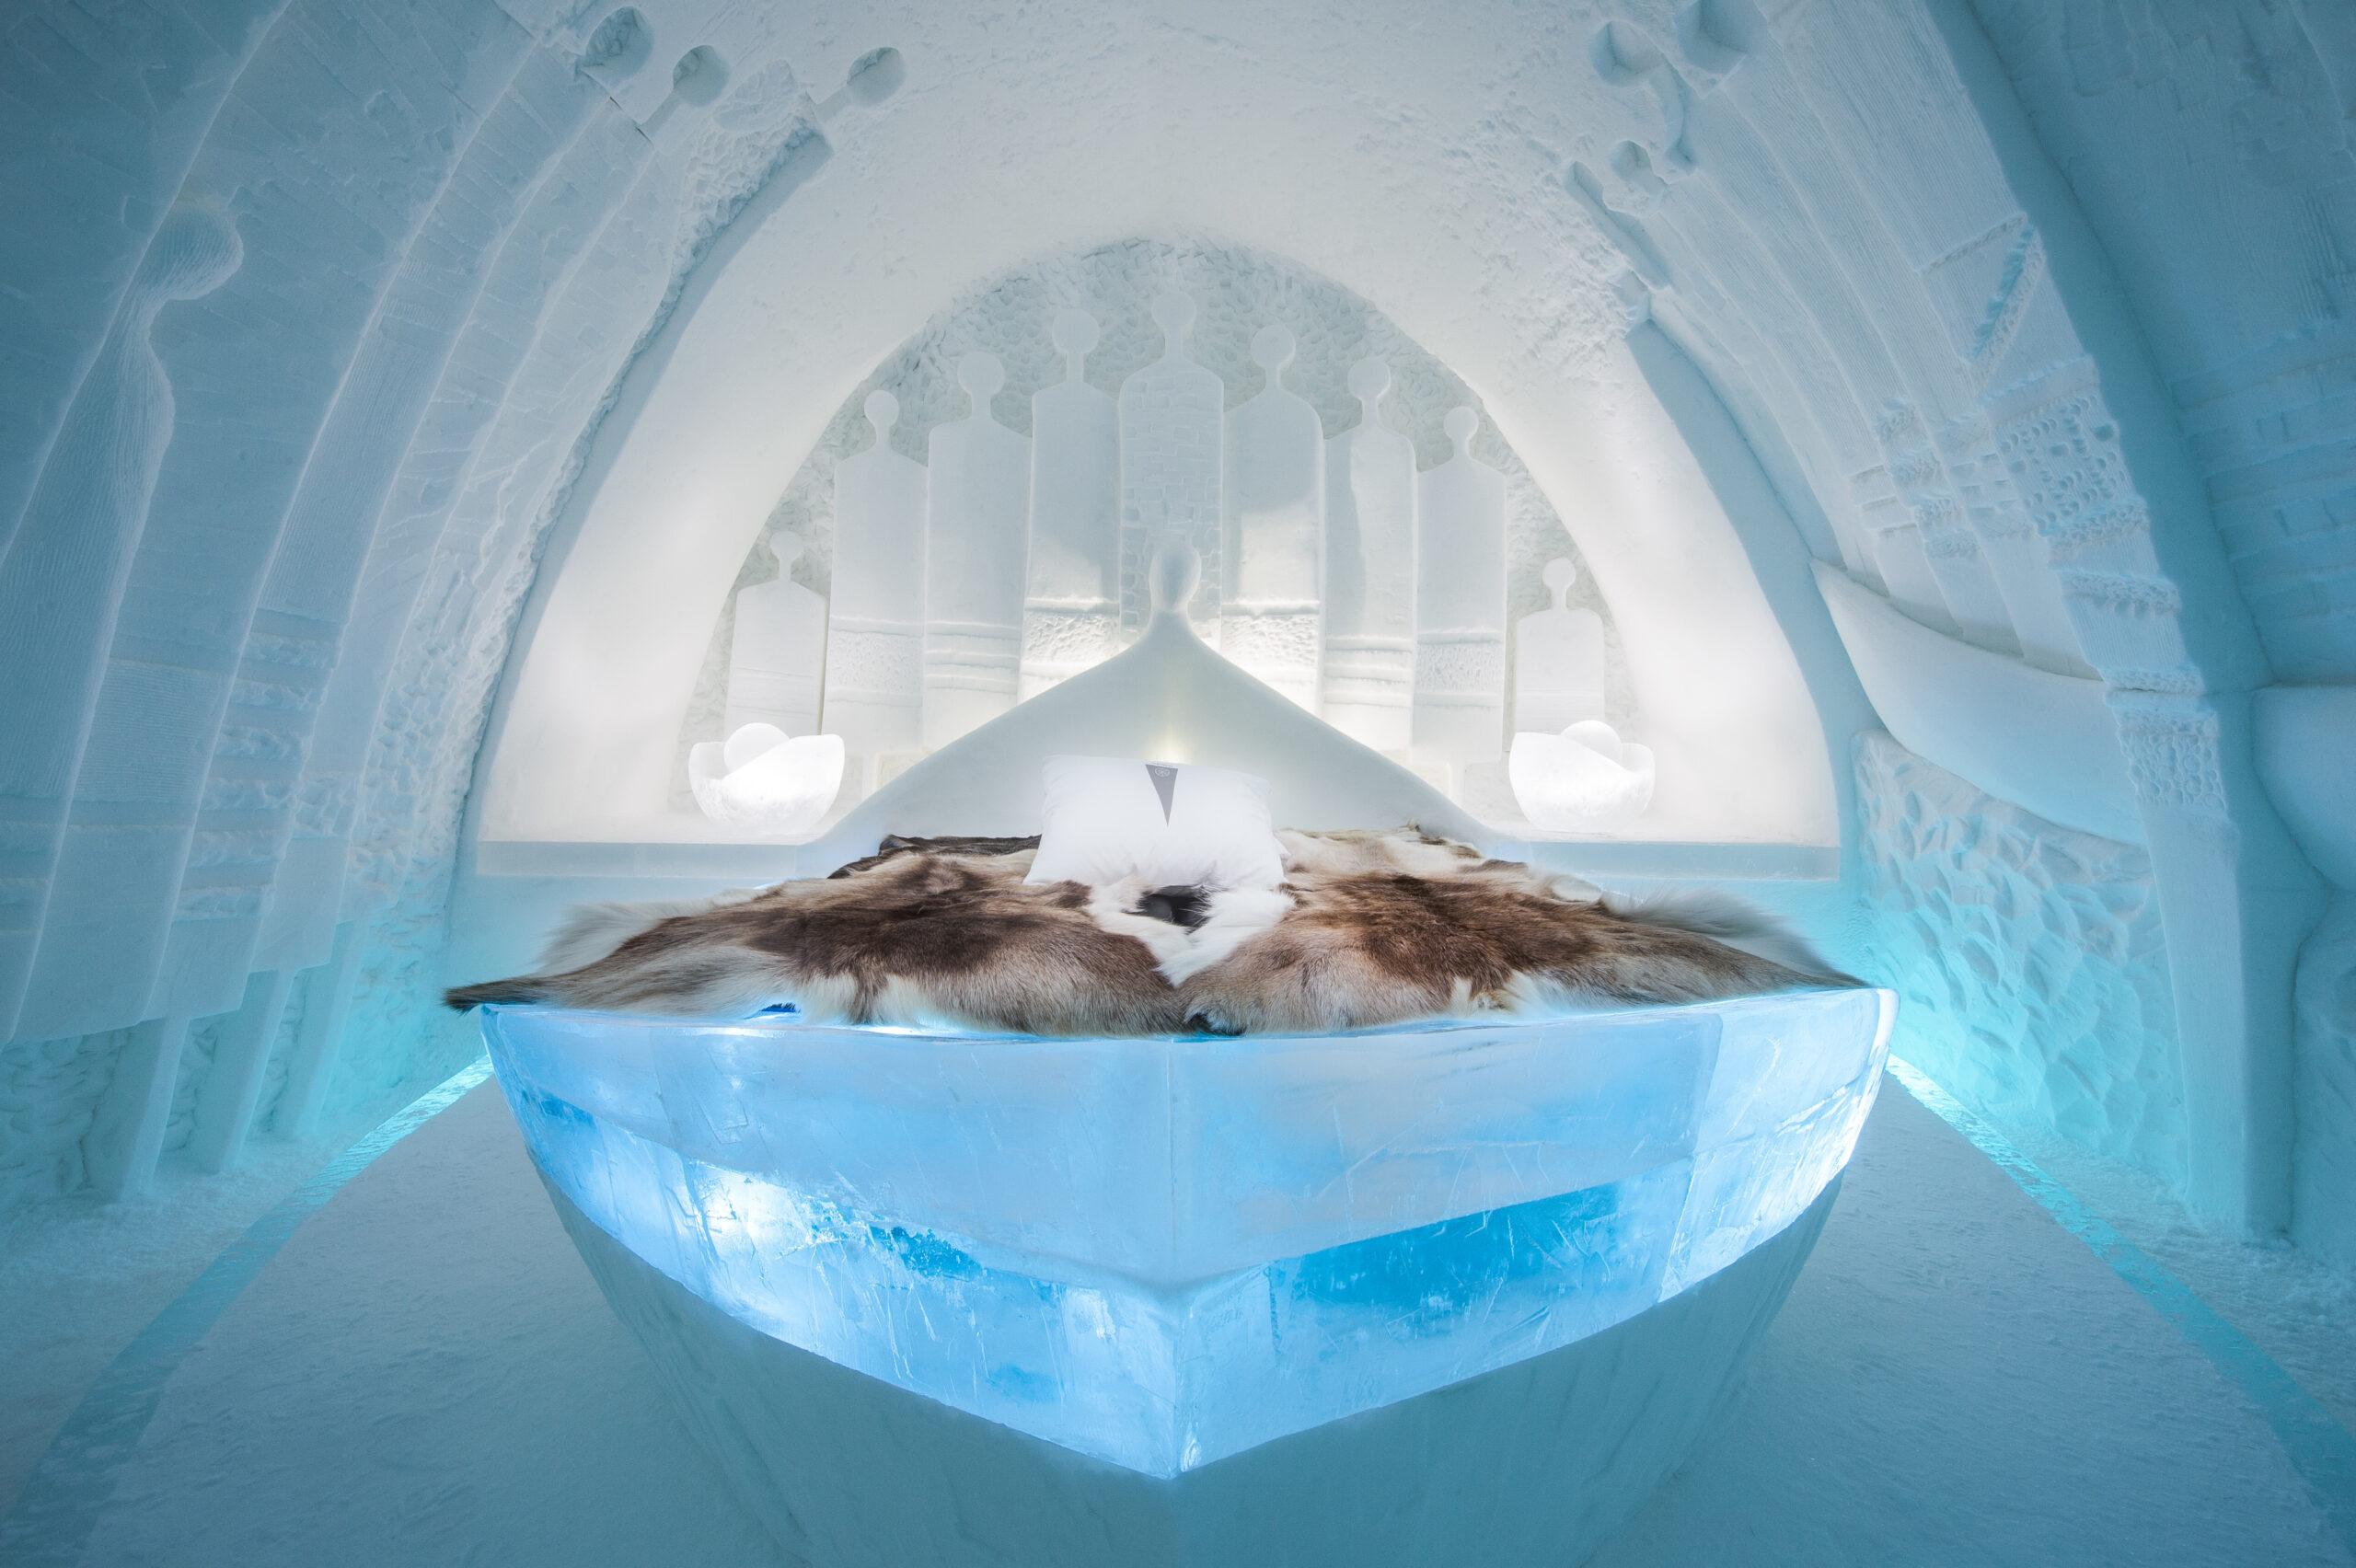 icehotel.com